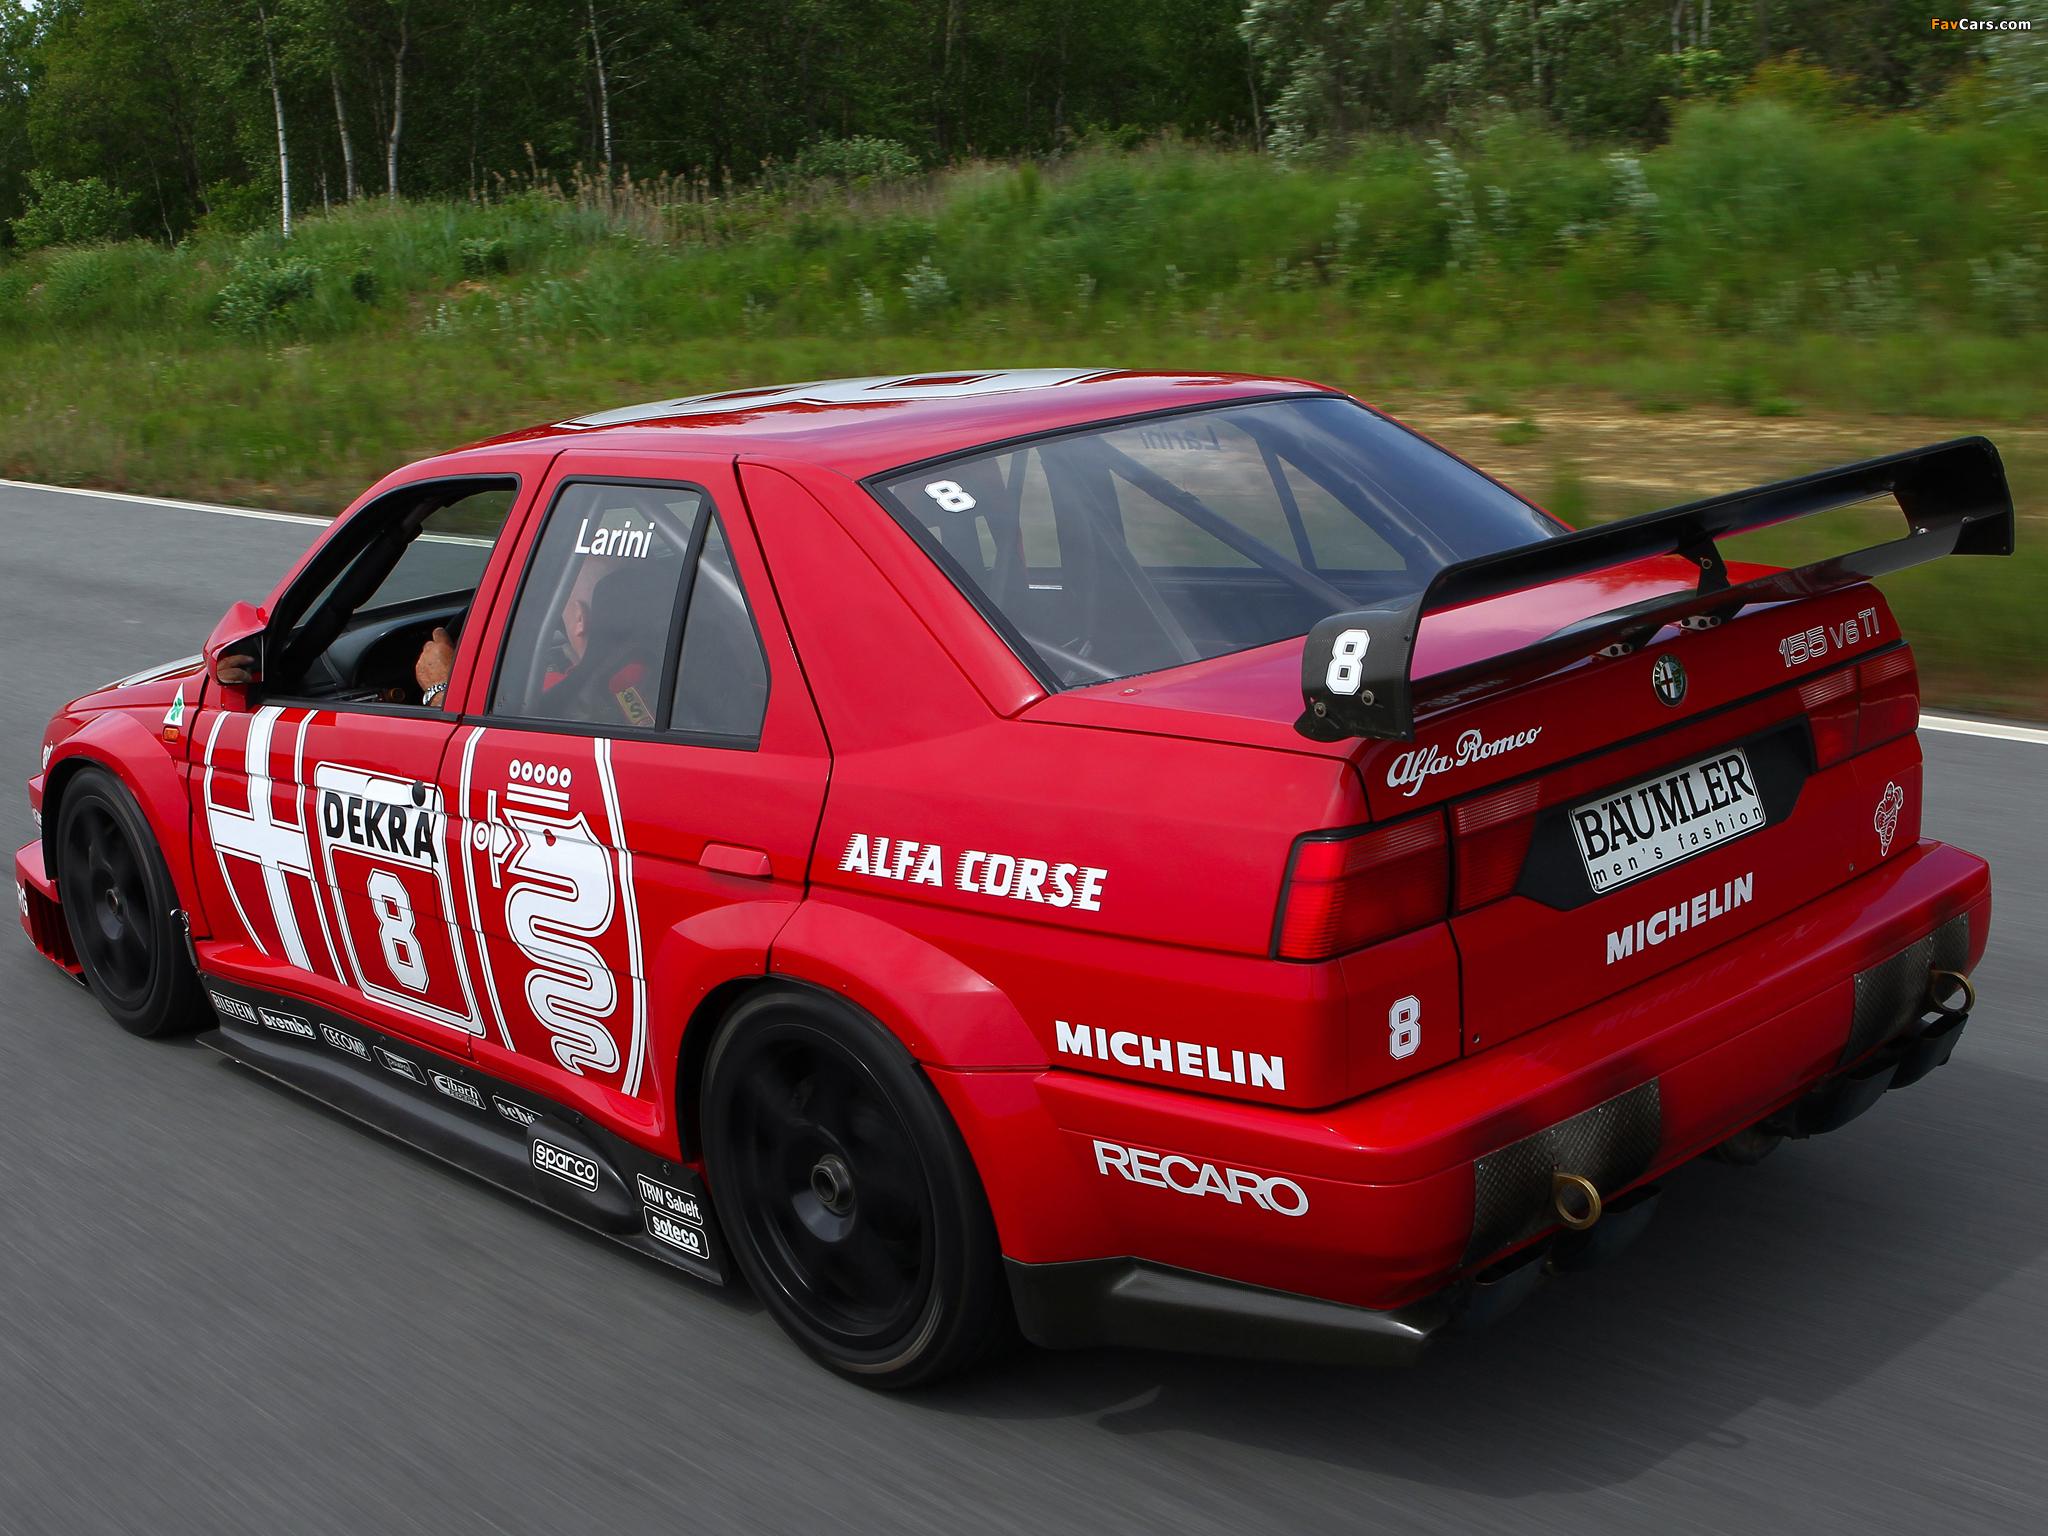 Alfa Romeo 155 2.5 V6 TI DTM SE052 (1993) pictures (2048 x 1536)